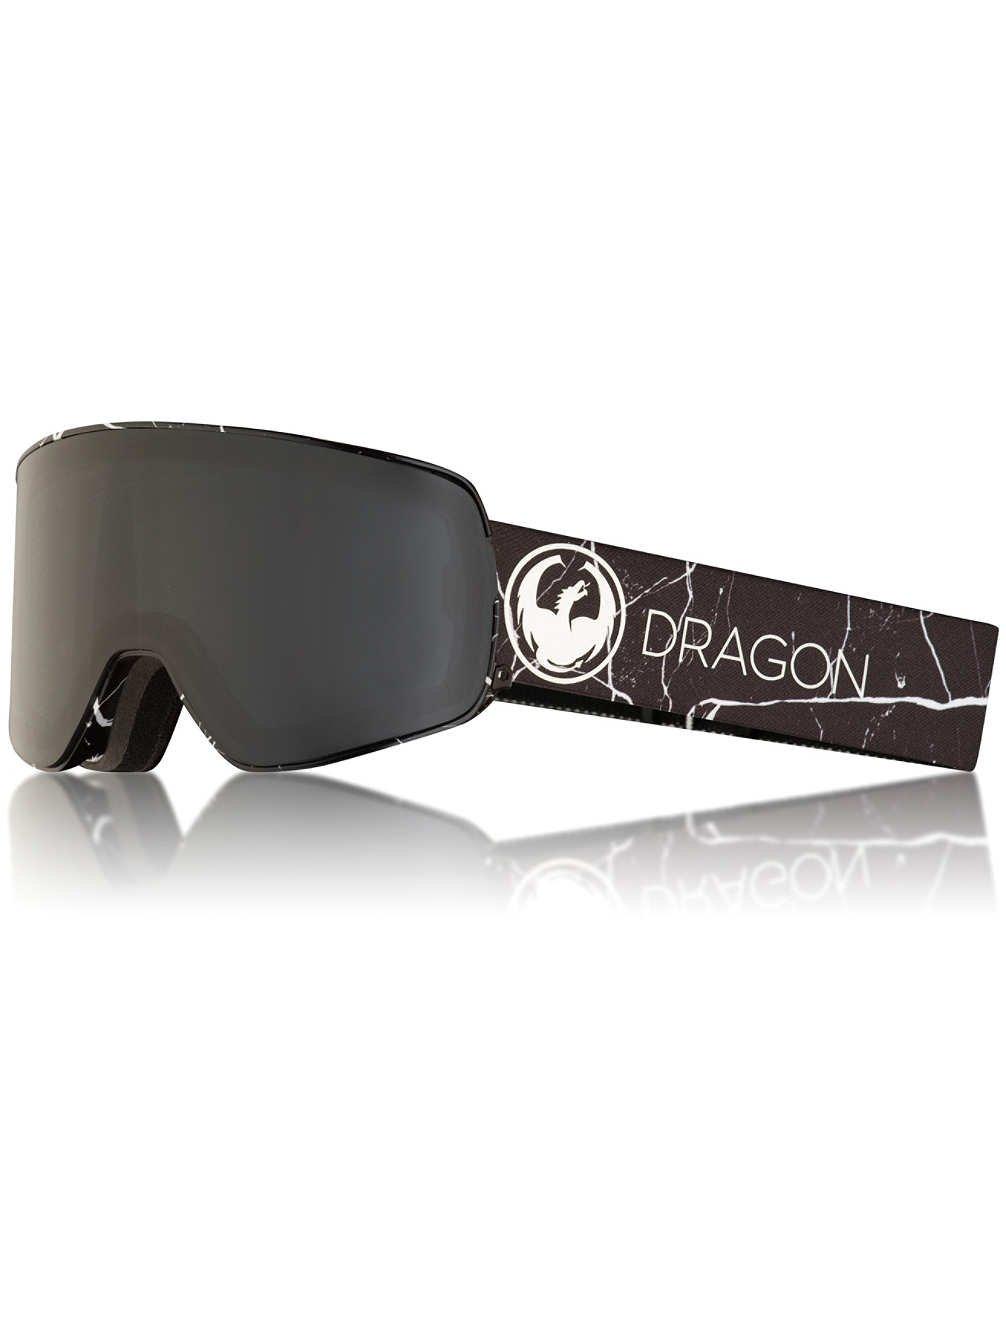 2af3d709e797 Amazon.com   Dragon NFX2 Signature Series Goggles - Men s Blake Paul  Sig Dark Smoke Plus Lum Rose